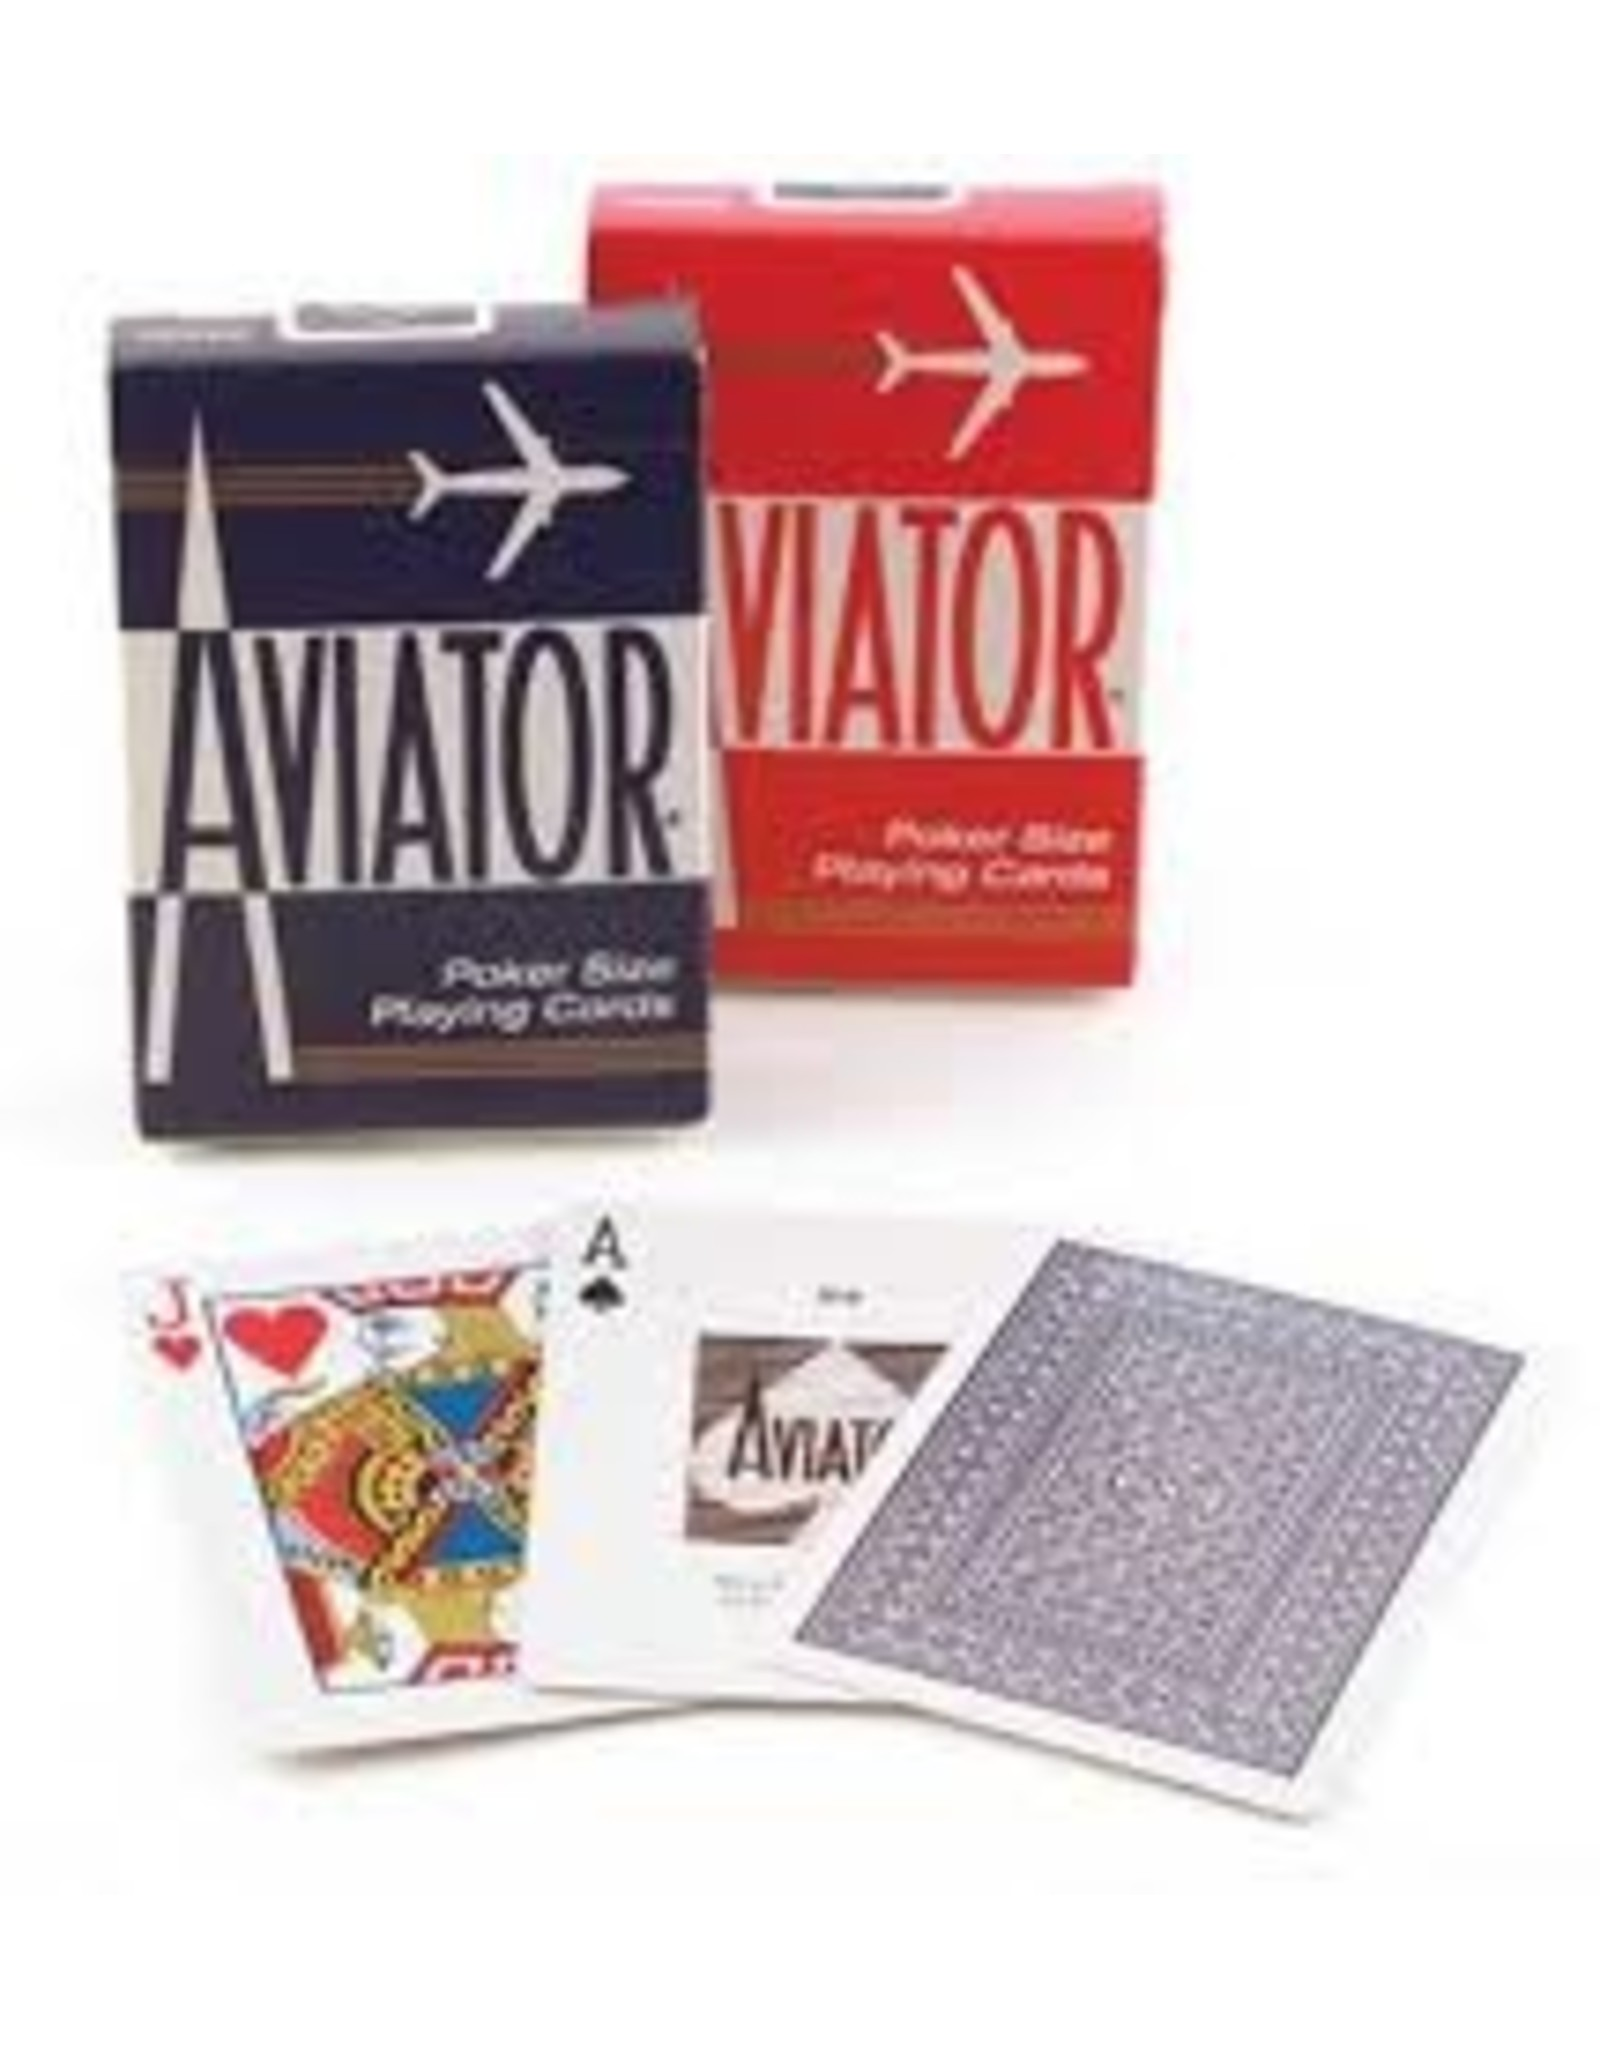 US Playing Card Co. Aviator Poker